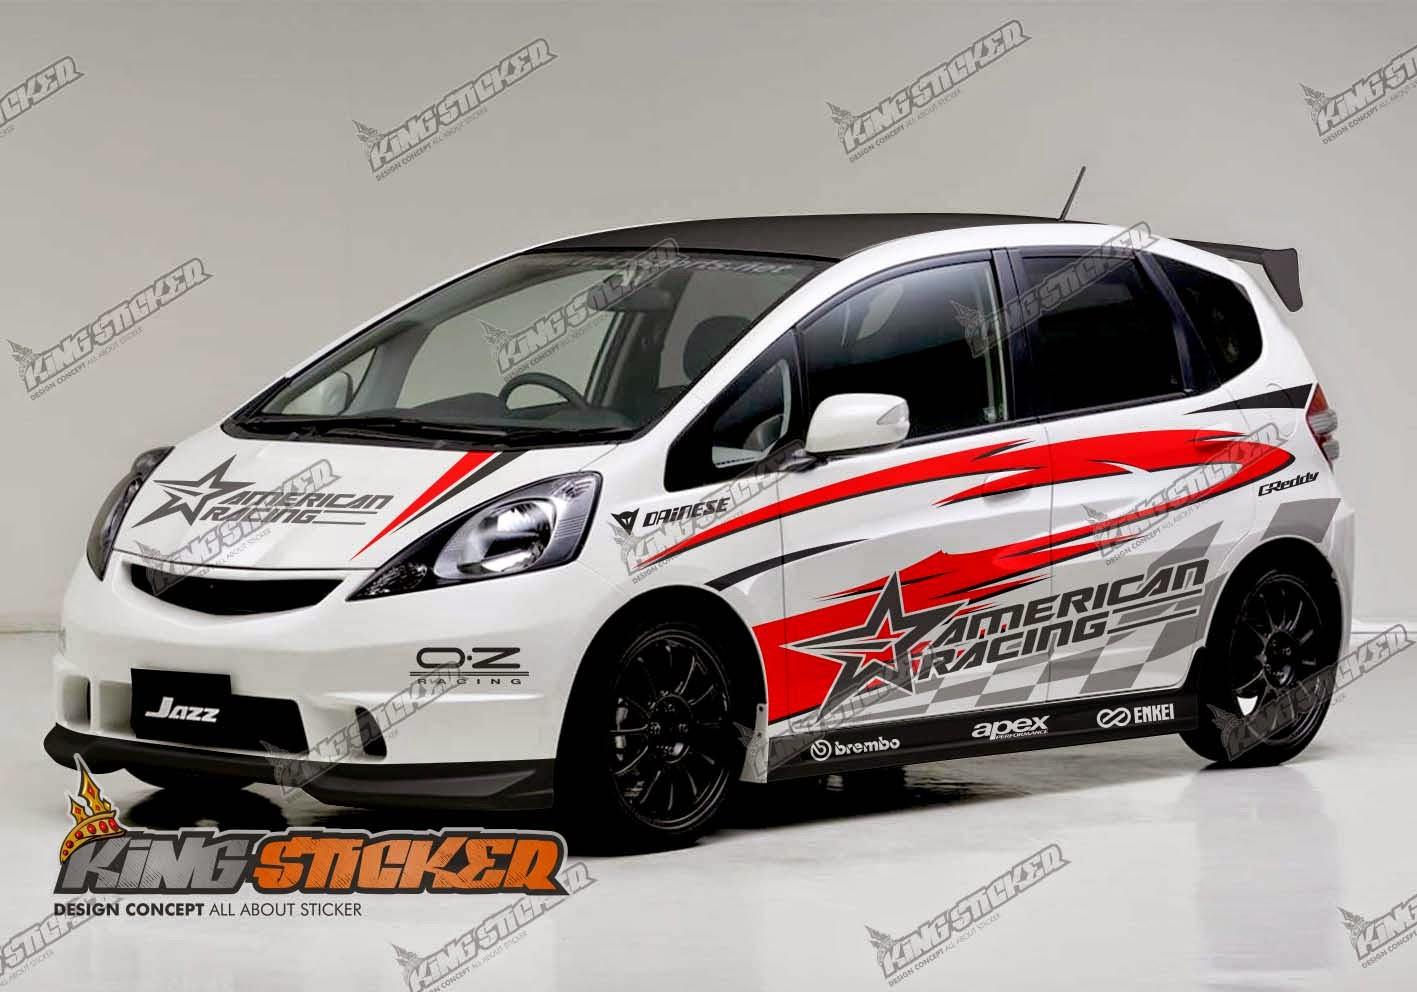 Sticker js racing - Cutting Sticker Honda Jazz Rs King Sticker Bali